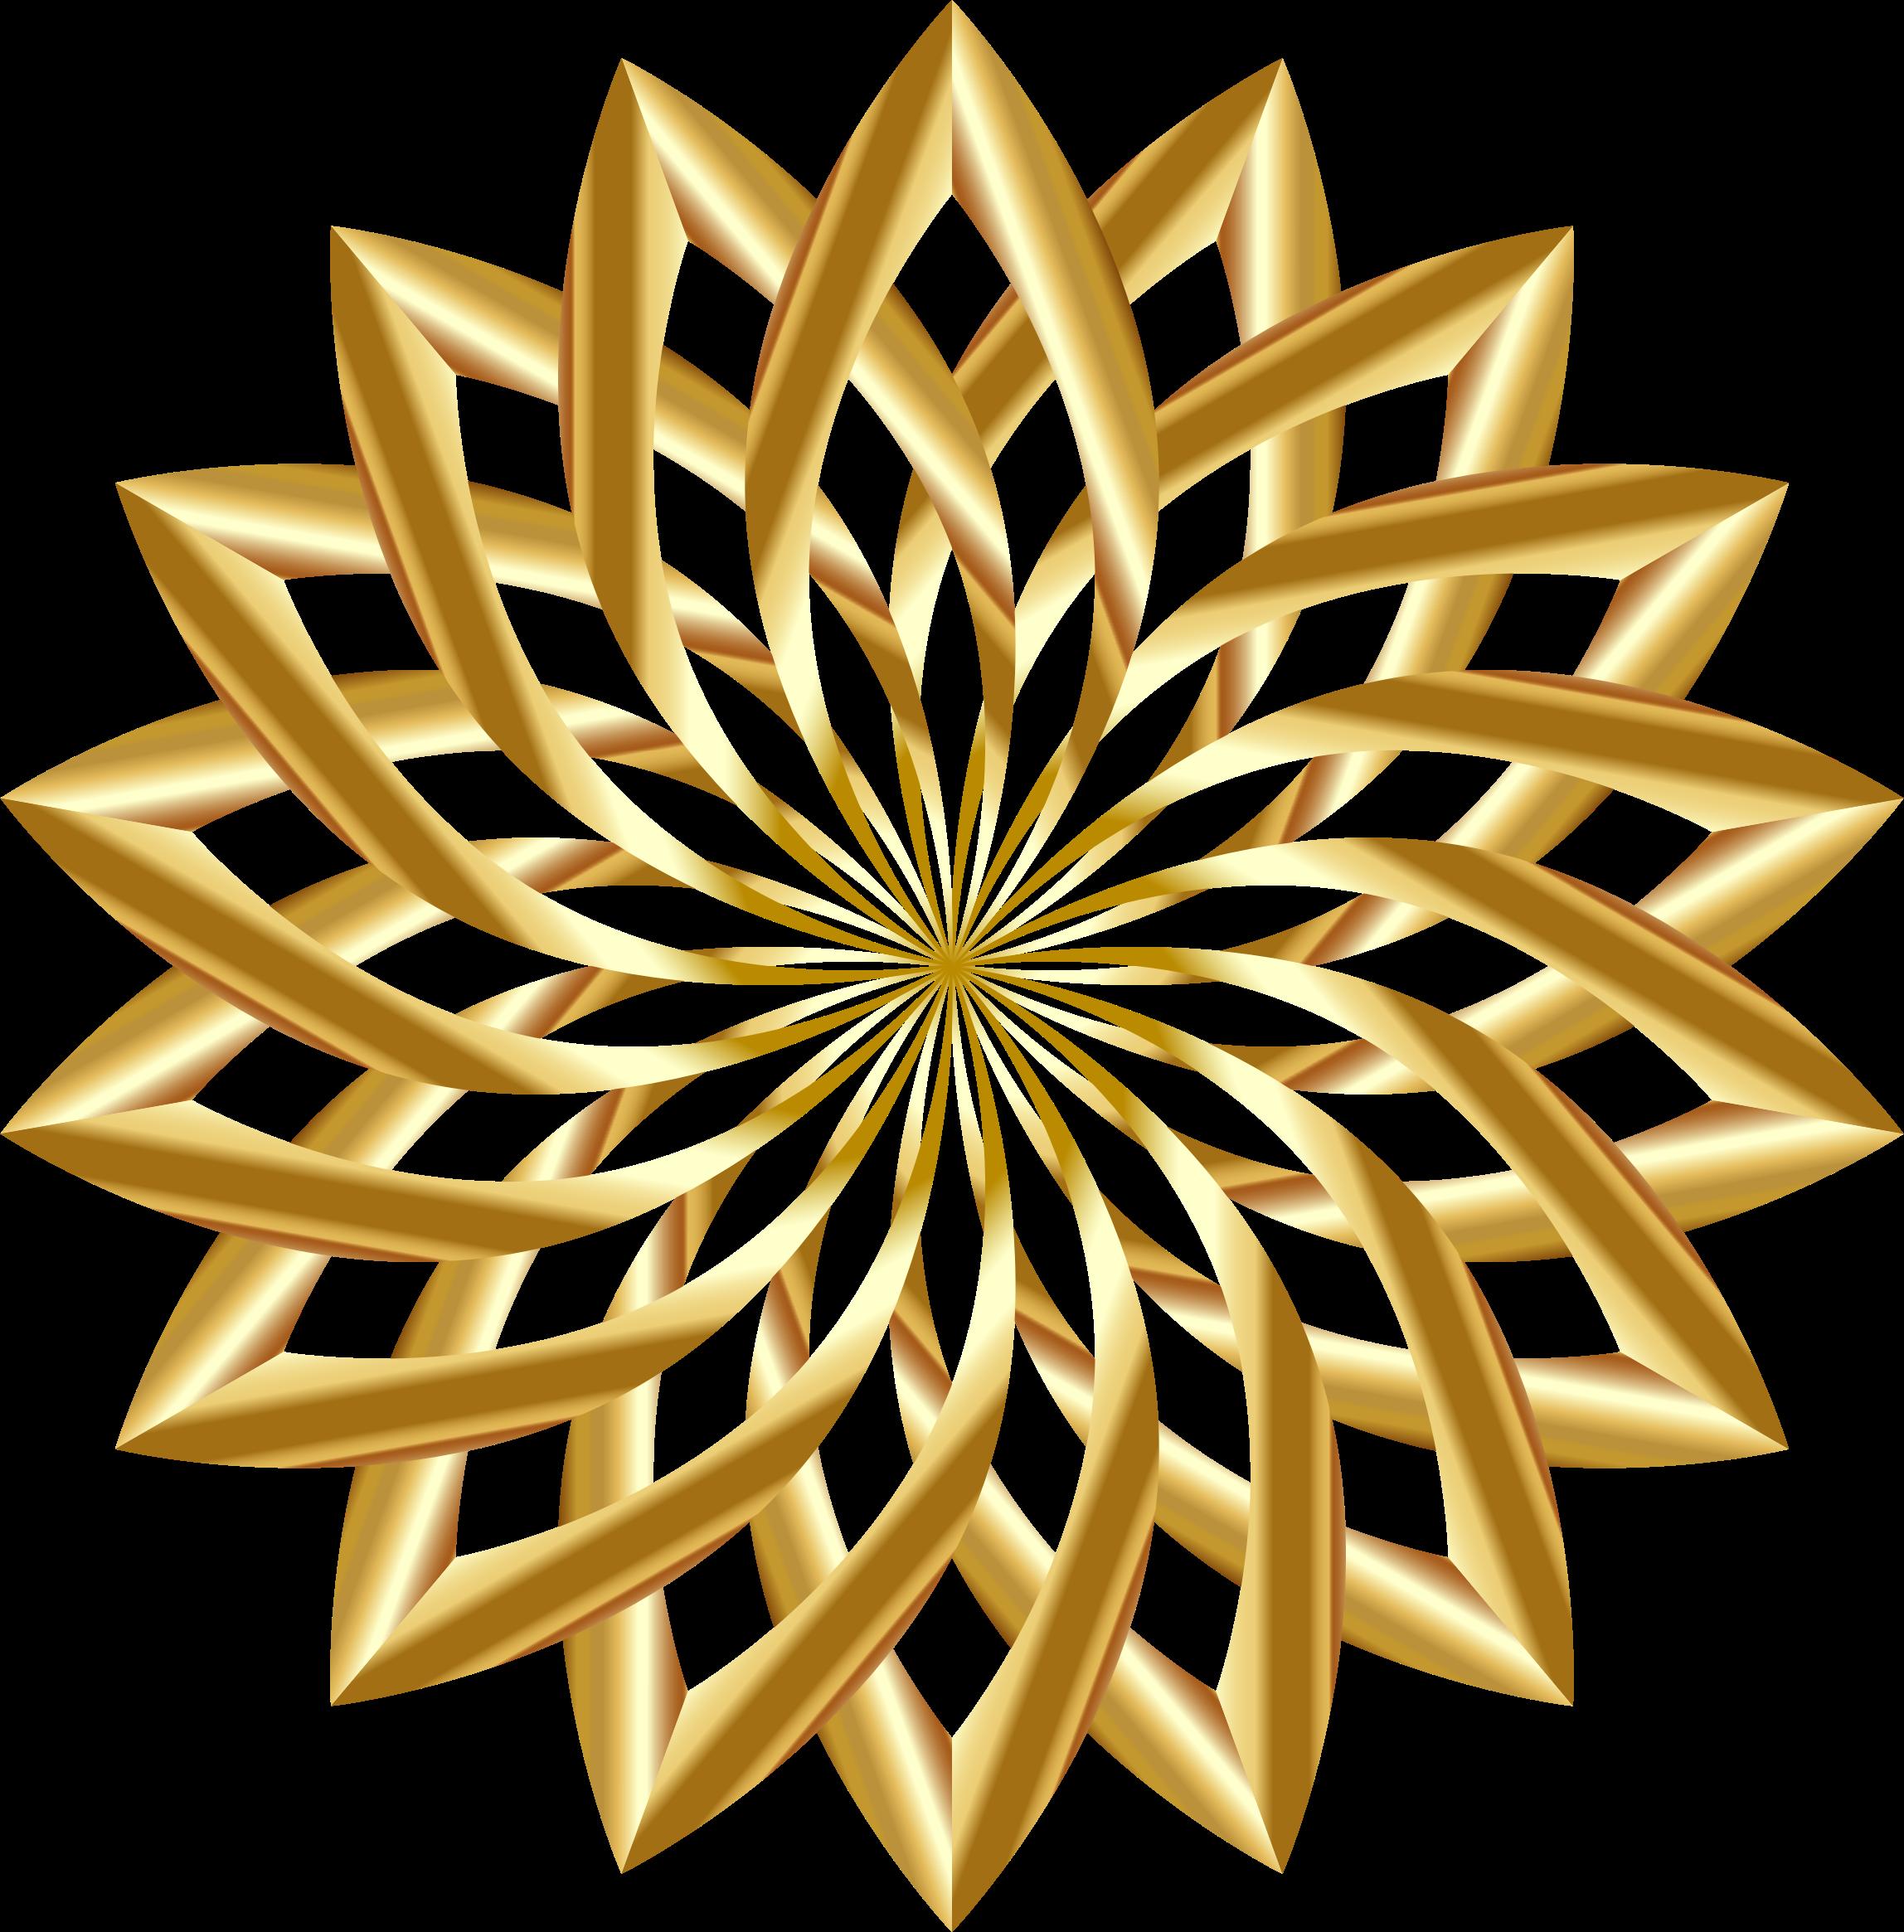 Torch clipart golden. Lotus no background big